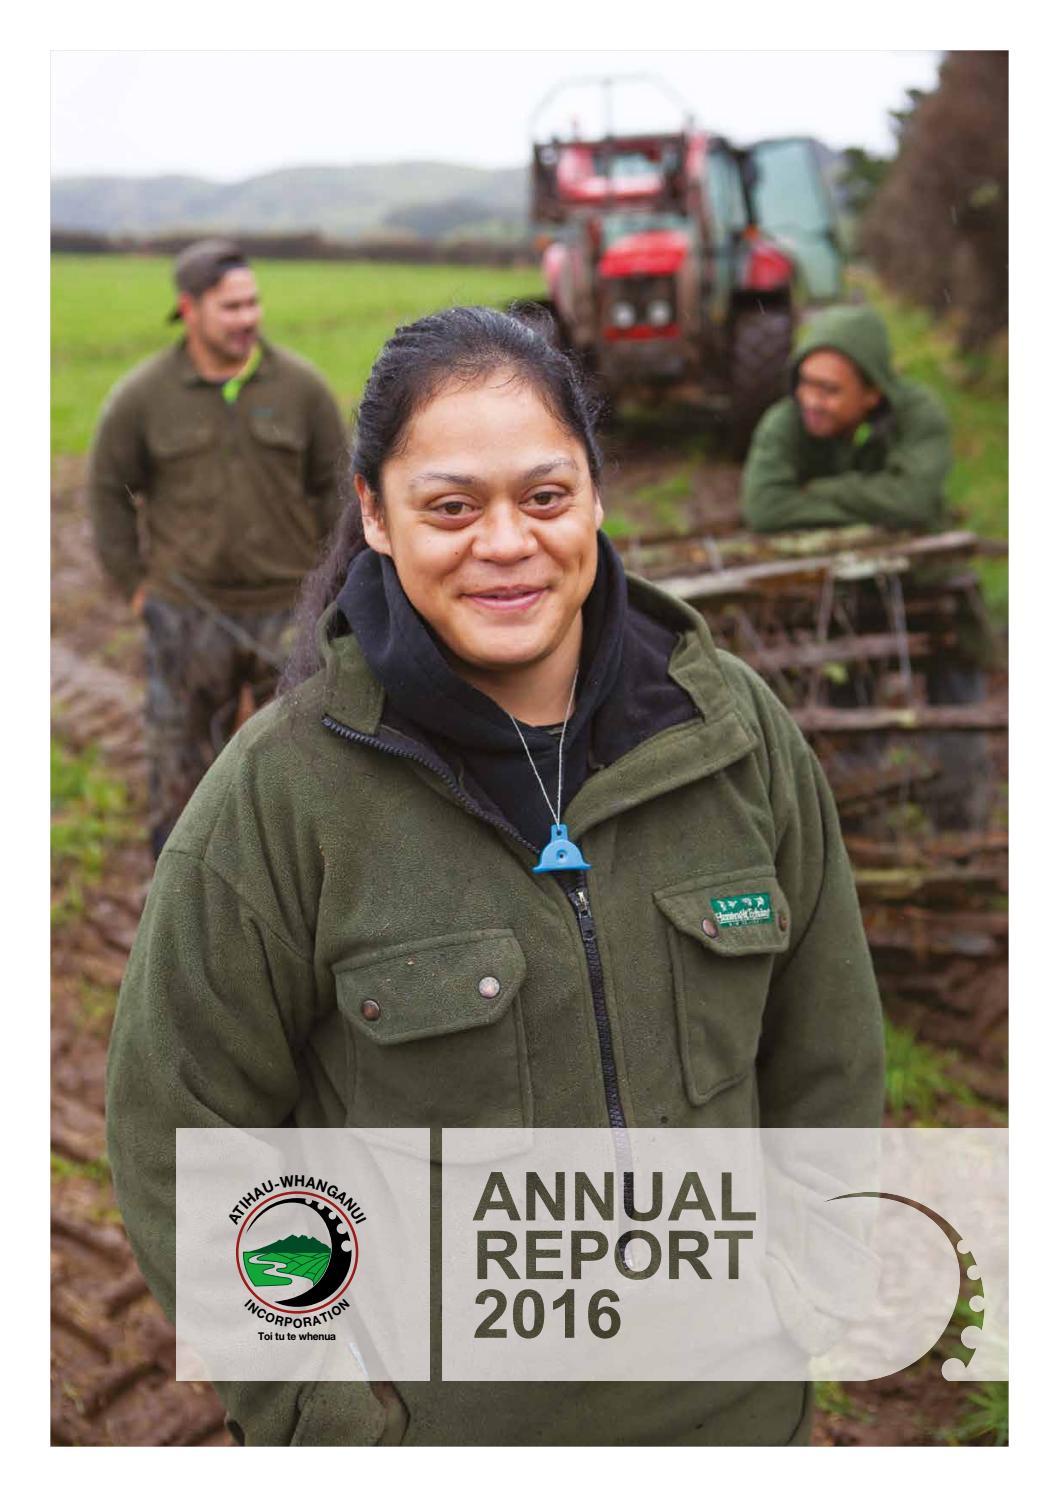 Blue apron financials -  Tihau Whanganui Incorporation Annual Report 2016 By Istudios Multimedia Ltd Issuu